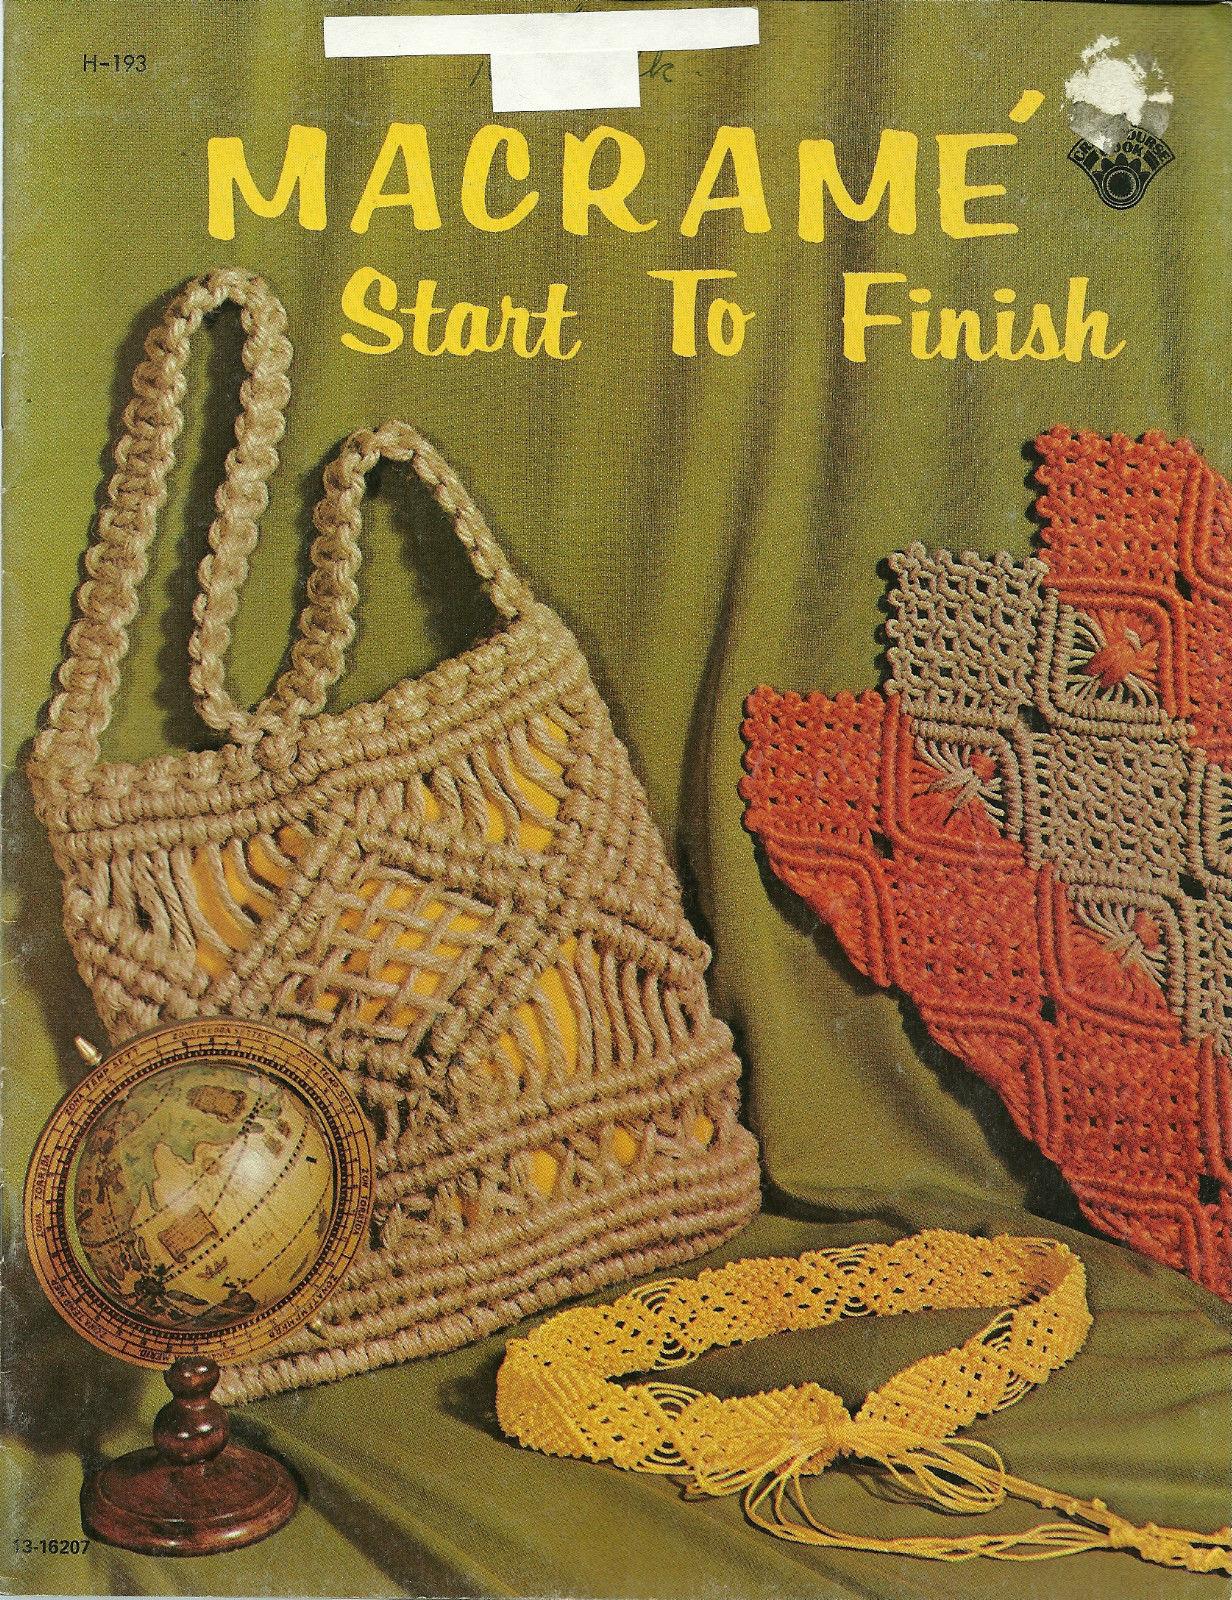 Macrame Start To Finish Booklet H-193  Candle Vase Cradle Necklaces Bracelet - $9.99